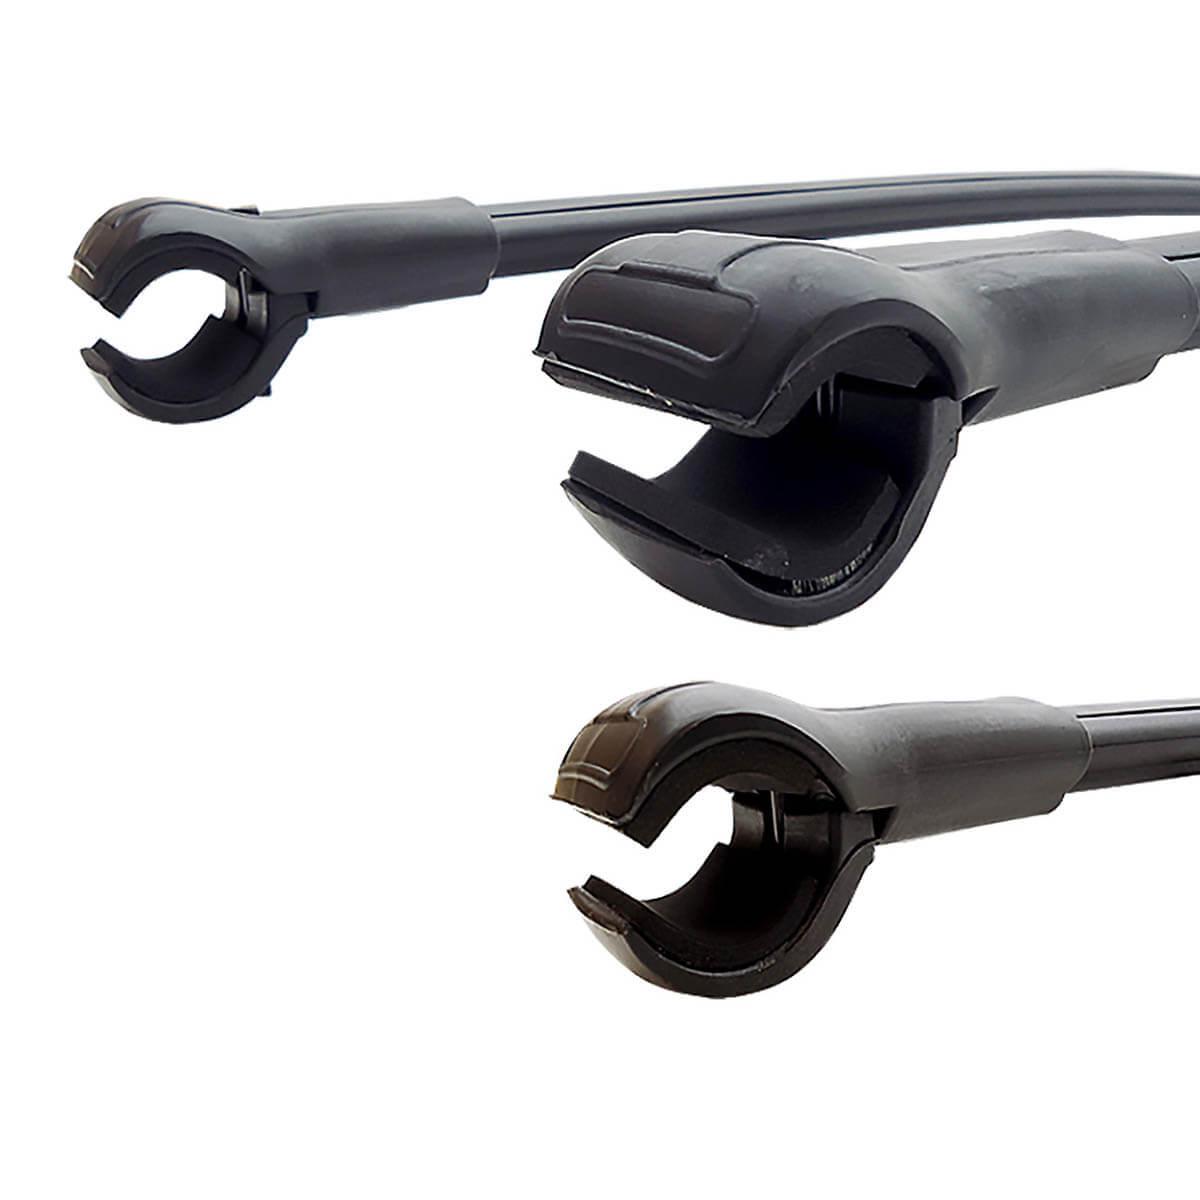 Travessa rack de teto larga preta alumínio Ecosport 2010 a 2012